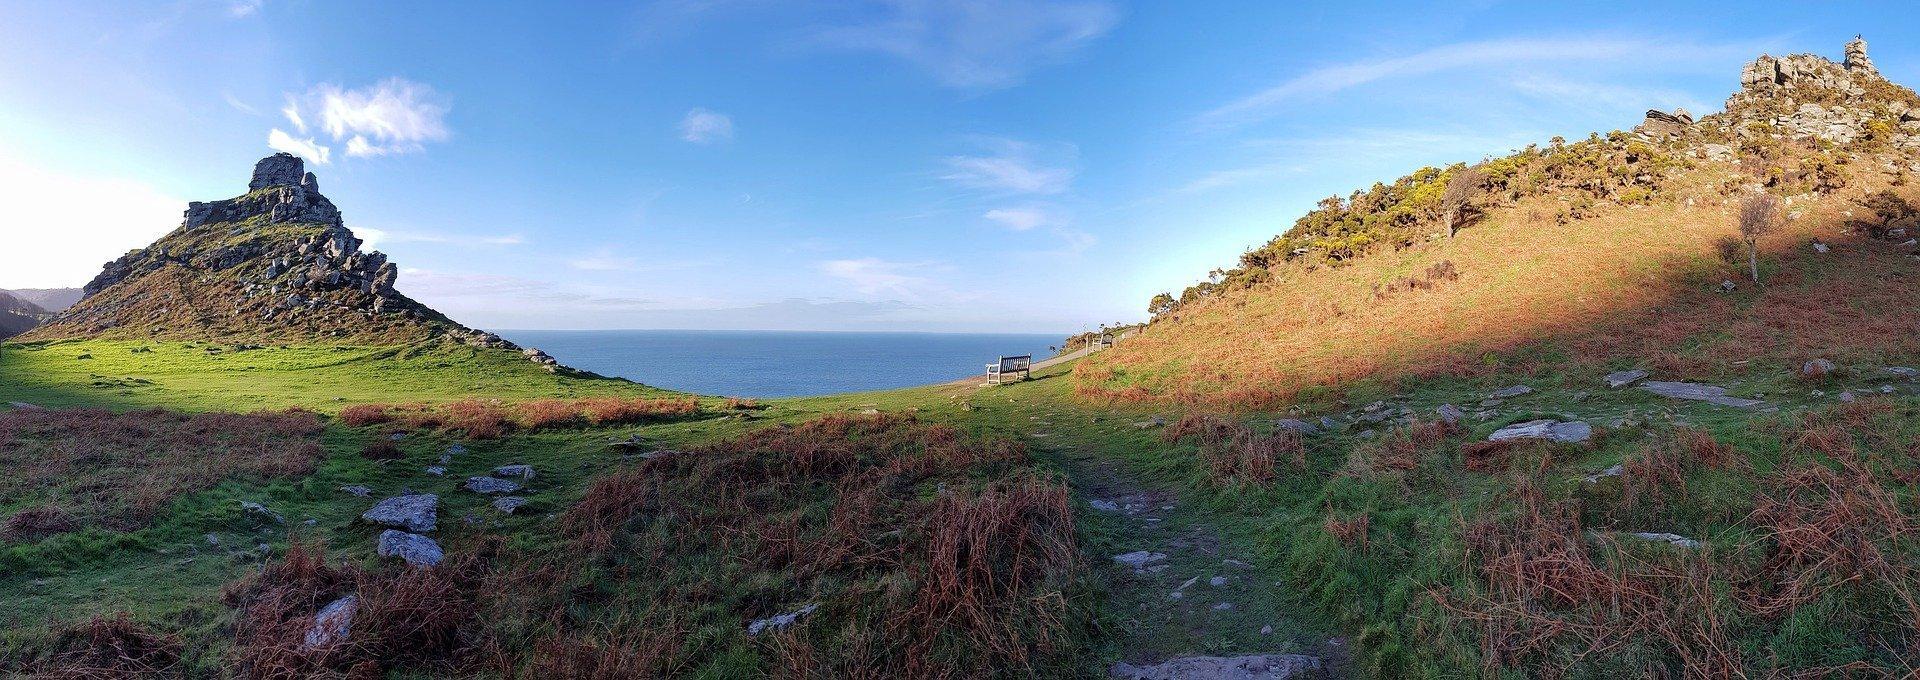 Valley of the Rocks - Lynton North Devon